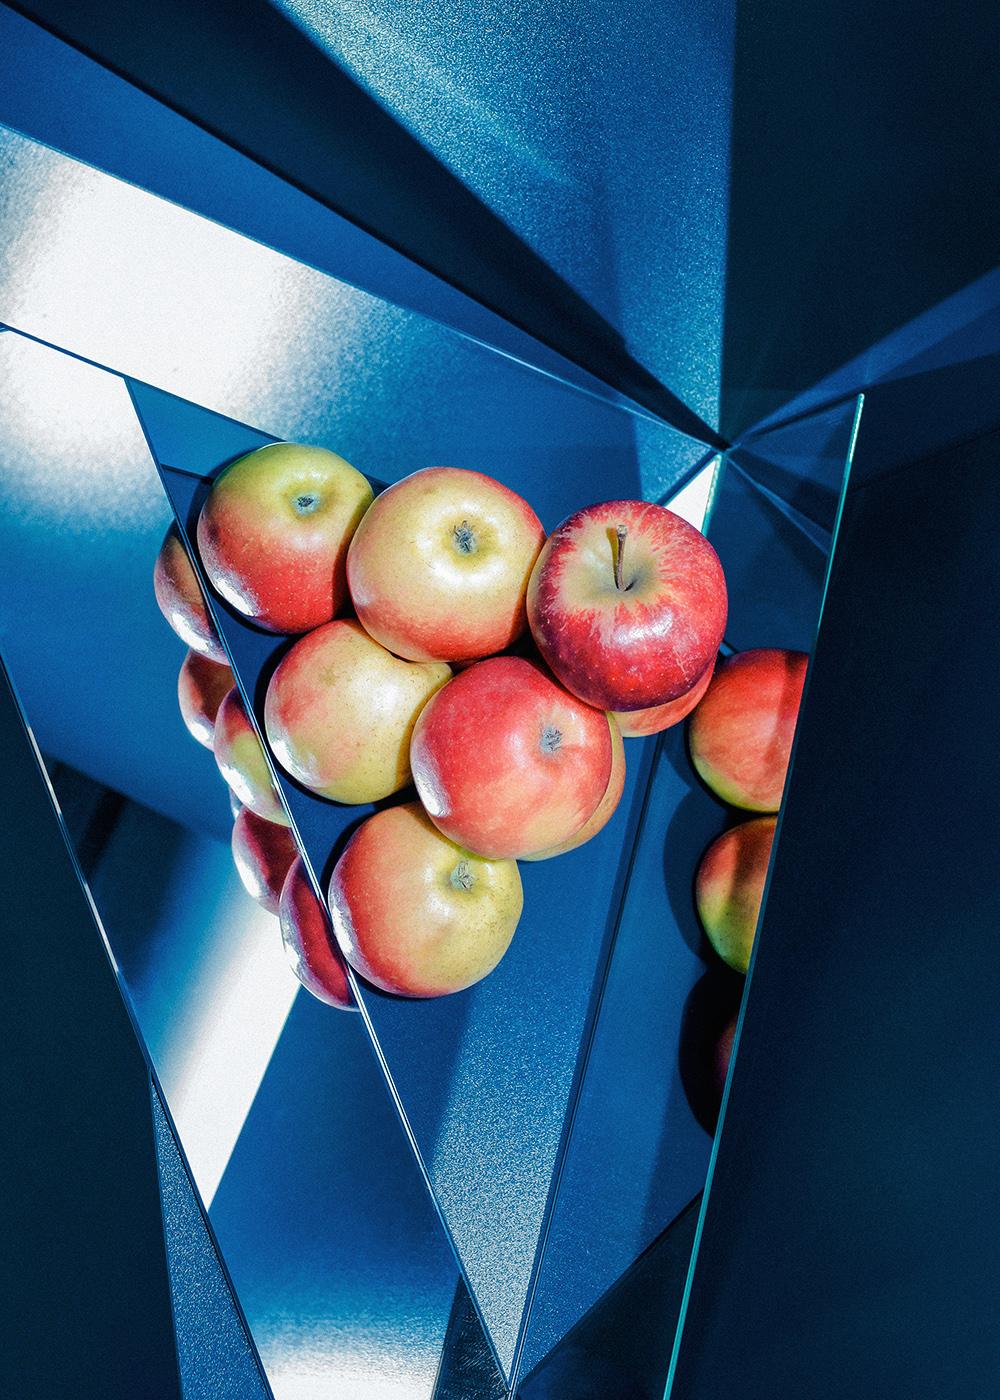 """untitled (structure 04)"", Fine Art Print on Photo Rag Paper, 35 x 25 cm, 2015 Edition of 3 + 2 AP. Courtesy der Künstler & Galerie Jette Rudolph, Berlin"